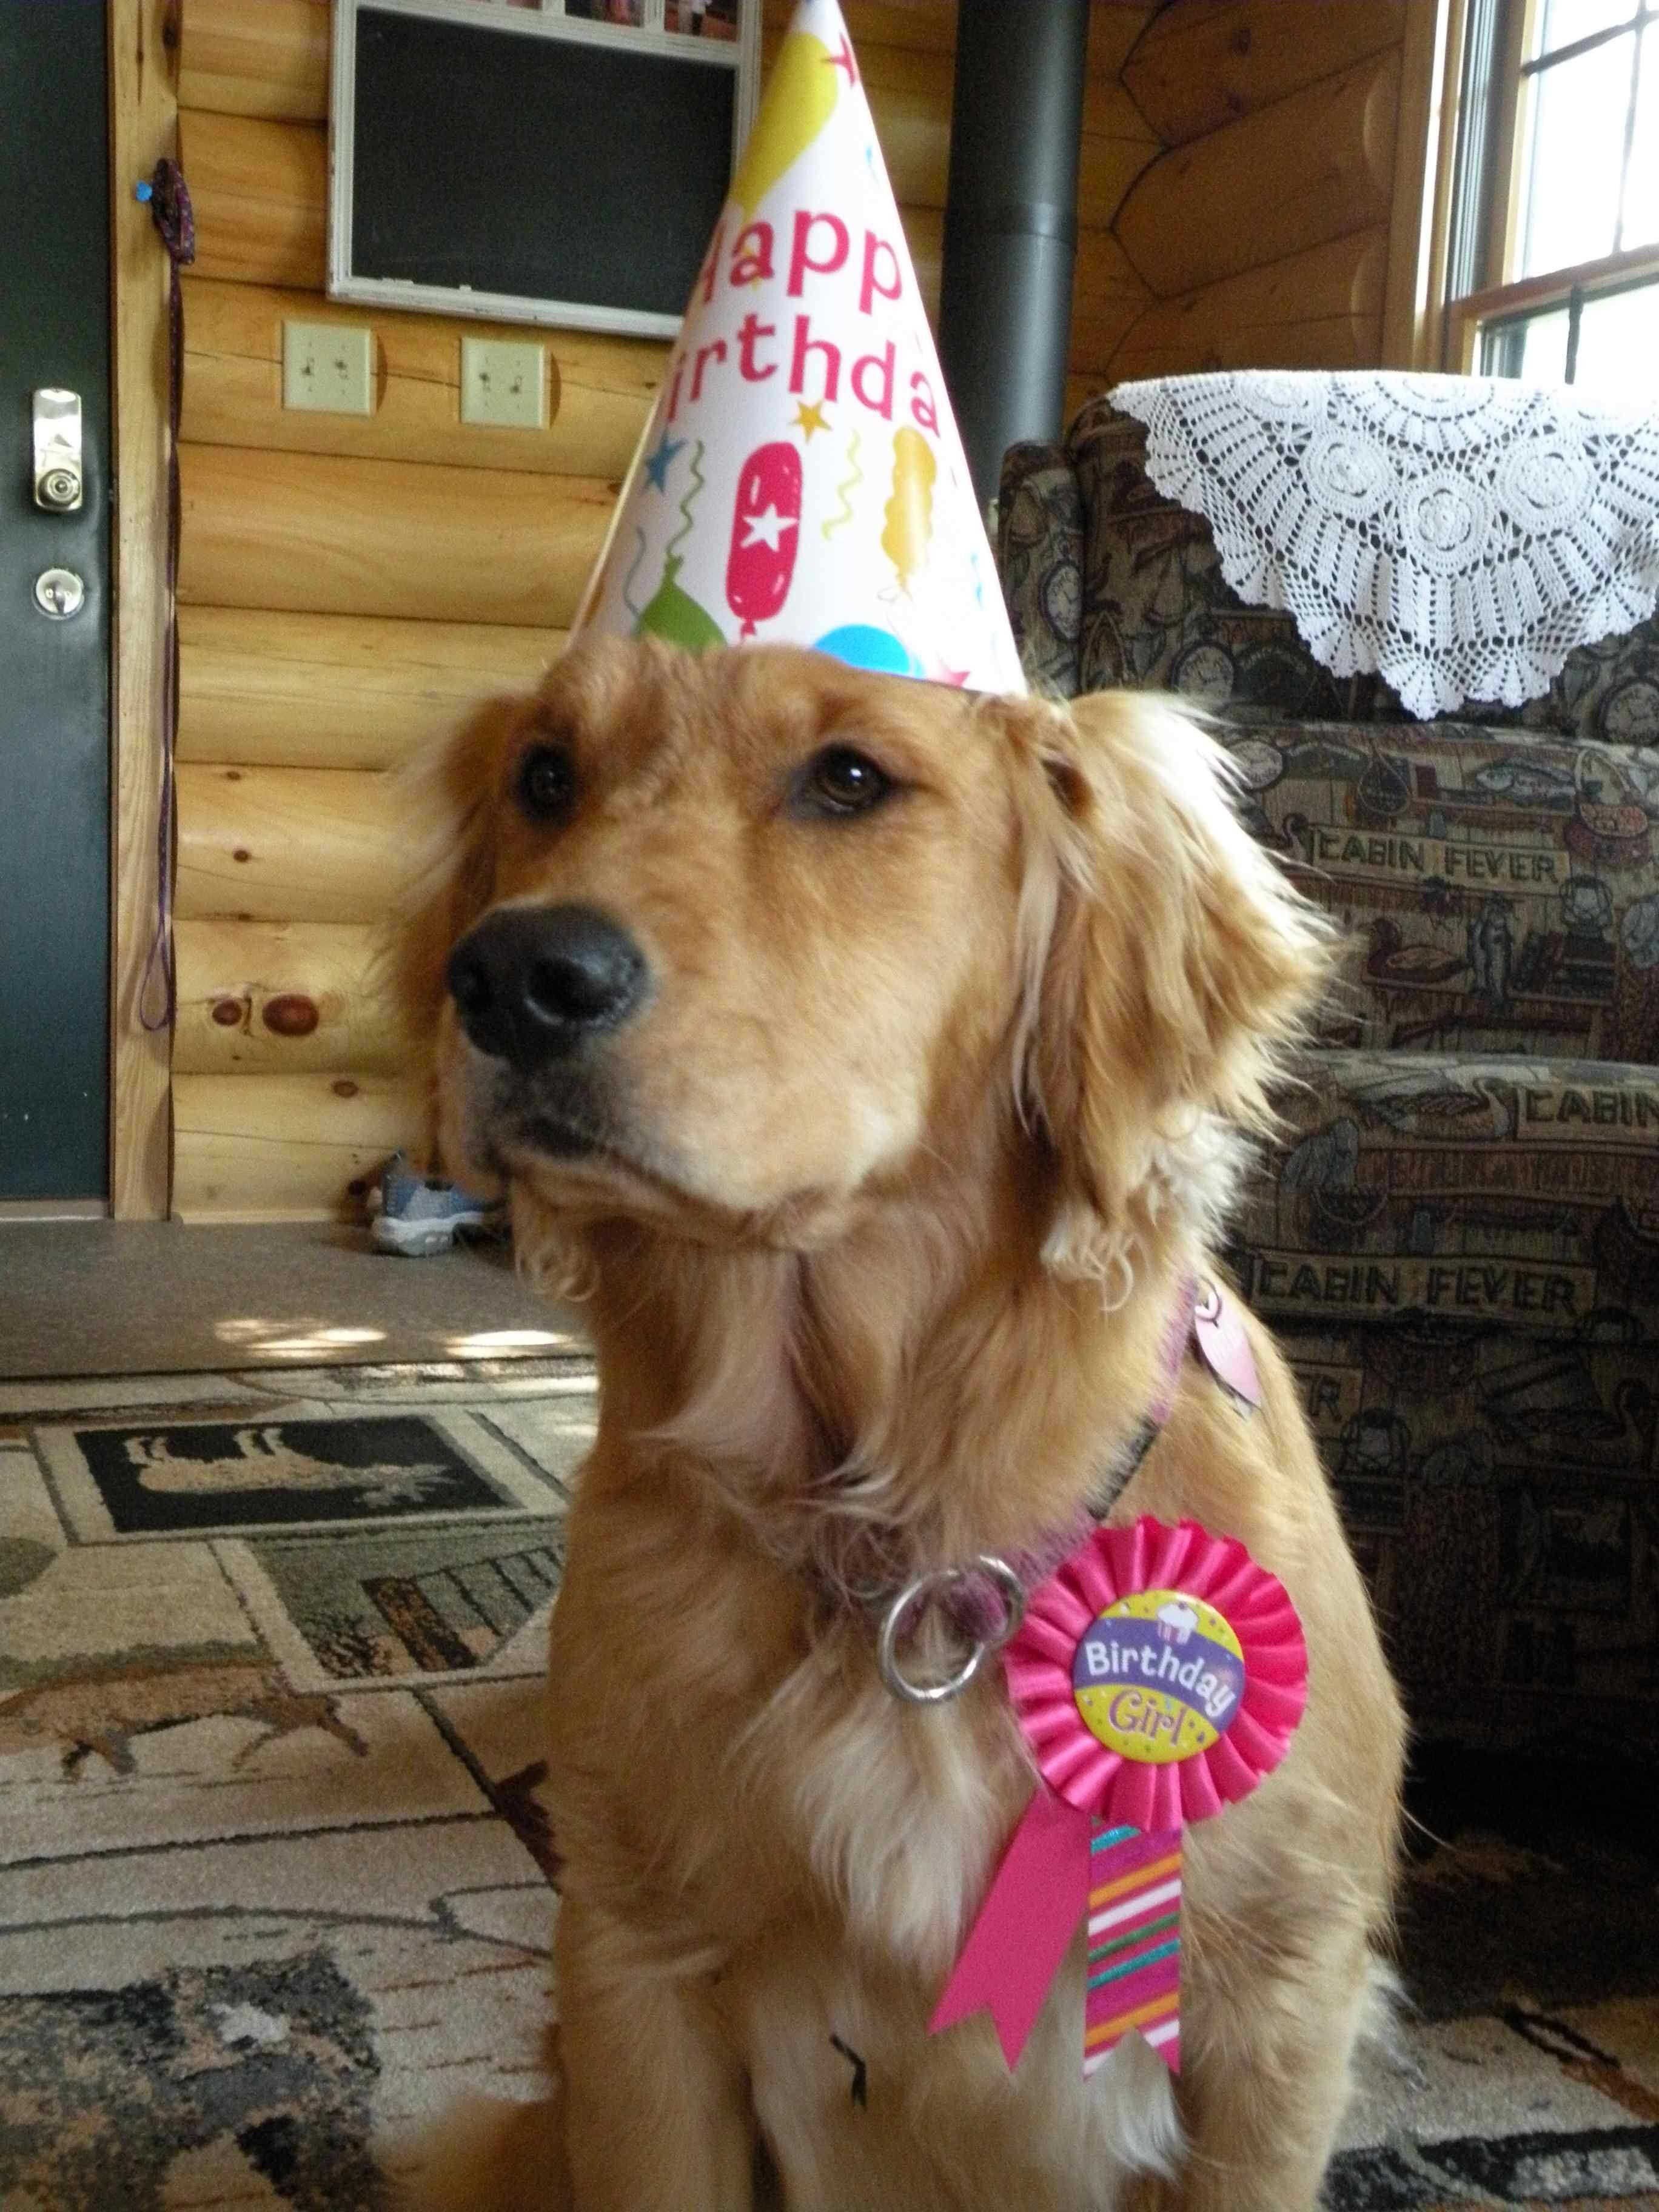 Dogs have birthdays too ya know Perritos